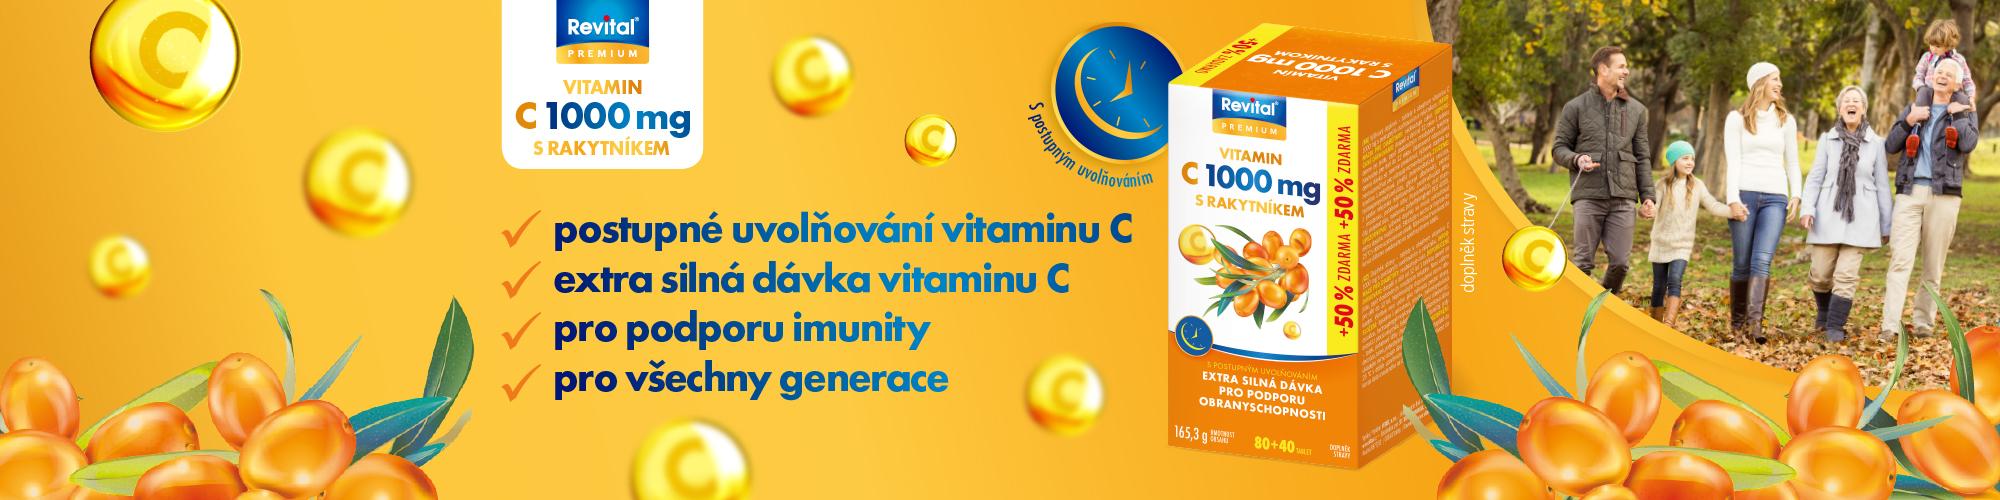 Revital Vitamin C + rakytník